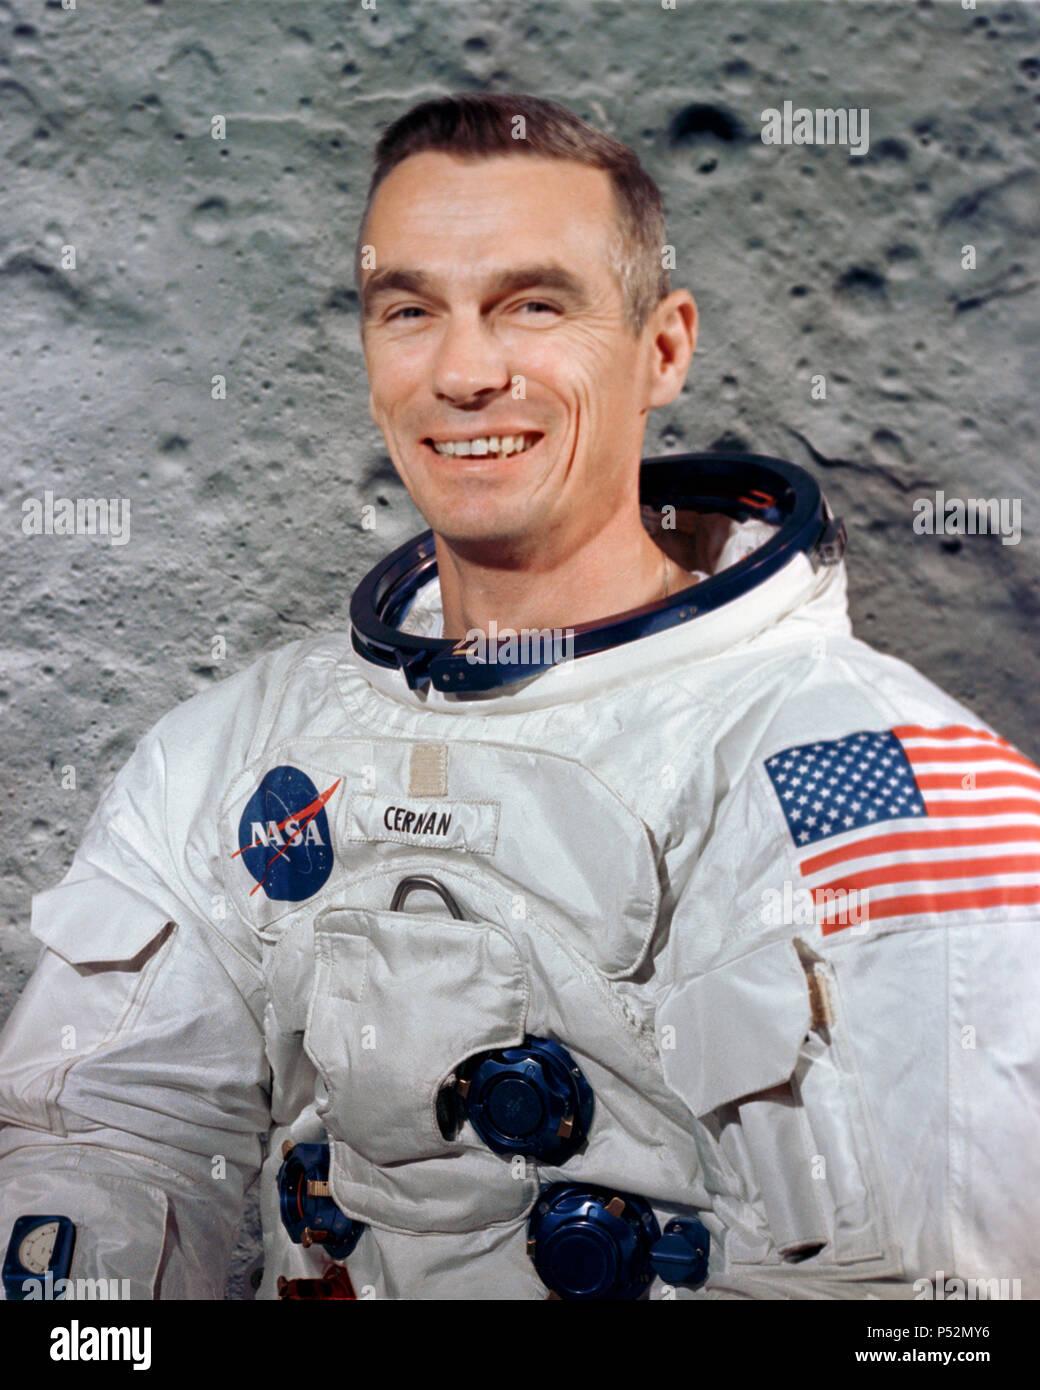 April 1969) - Astronaut Eugene A  Cernan, prime crew lunar